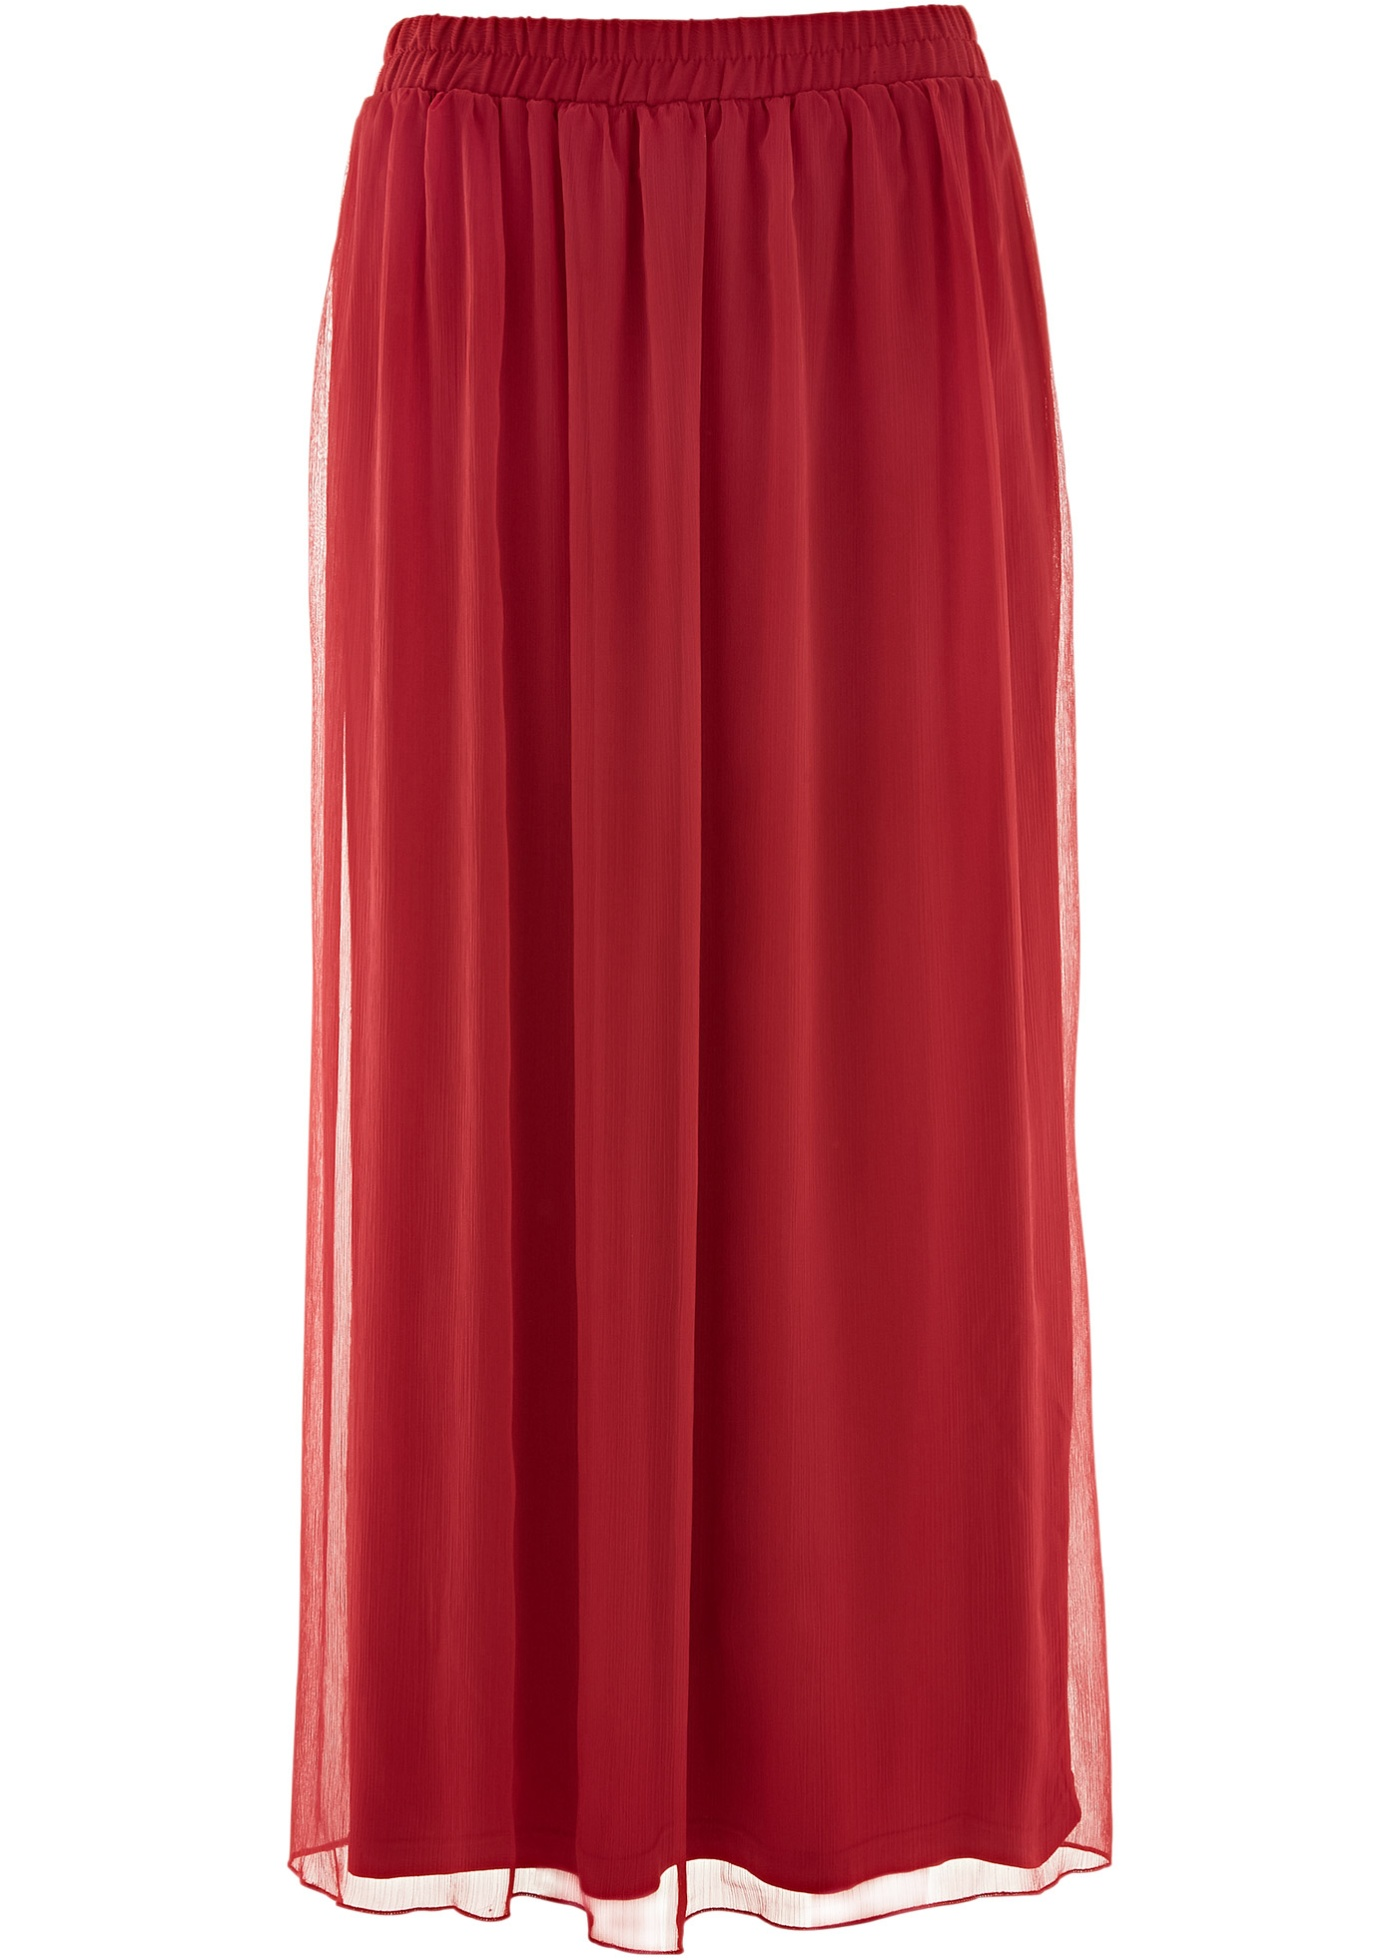 Jupe longue en chiffon rouge femme - bonprix